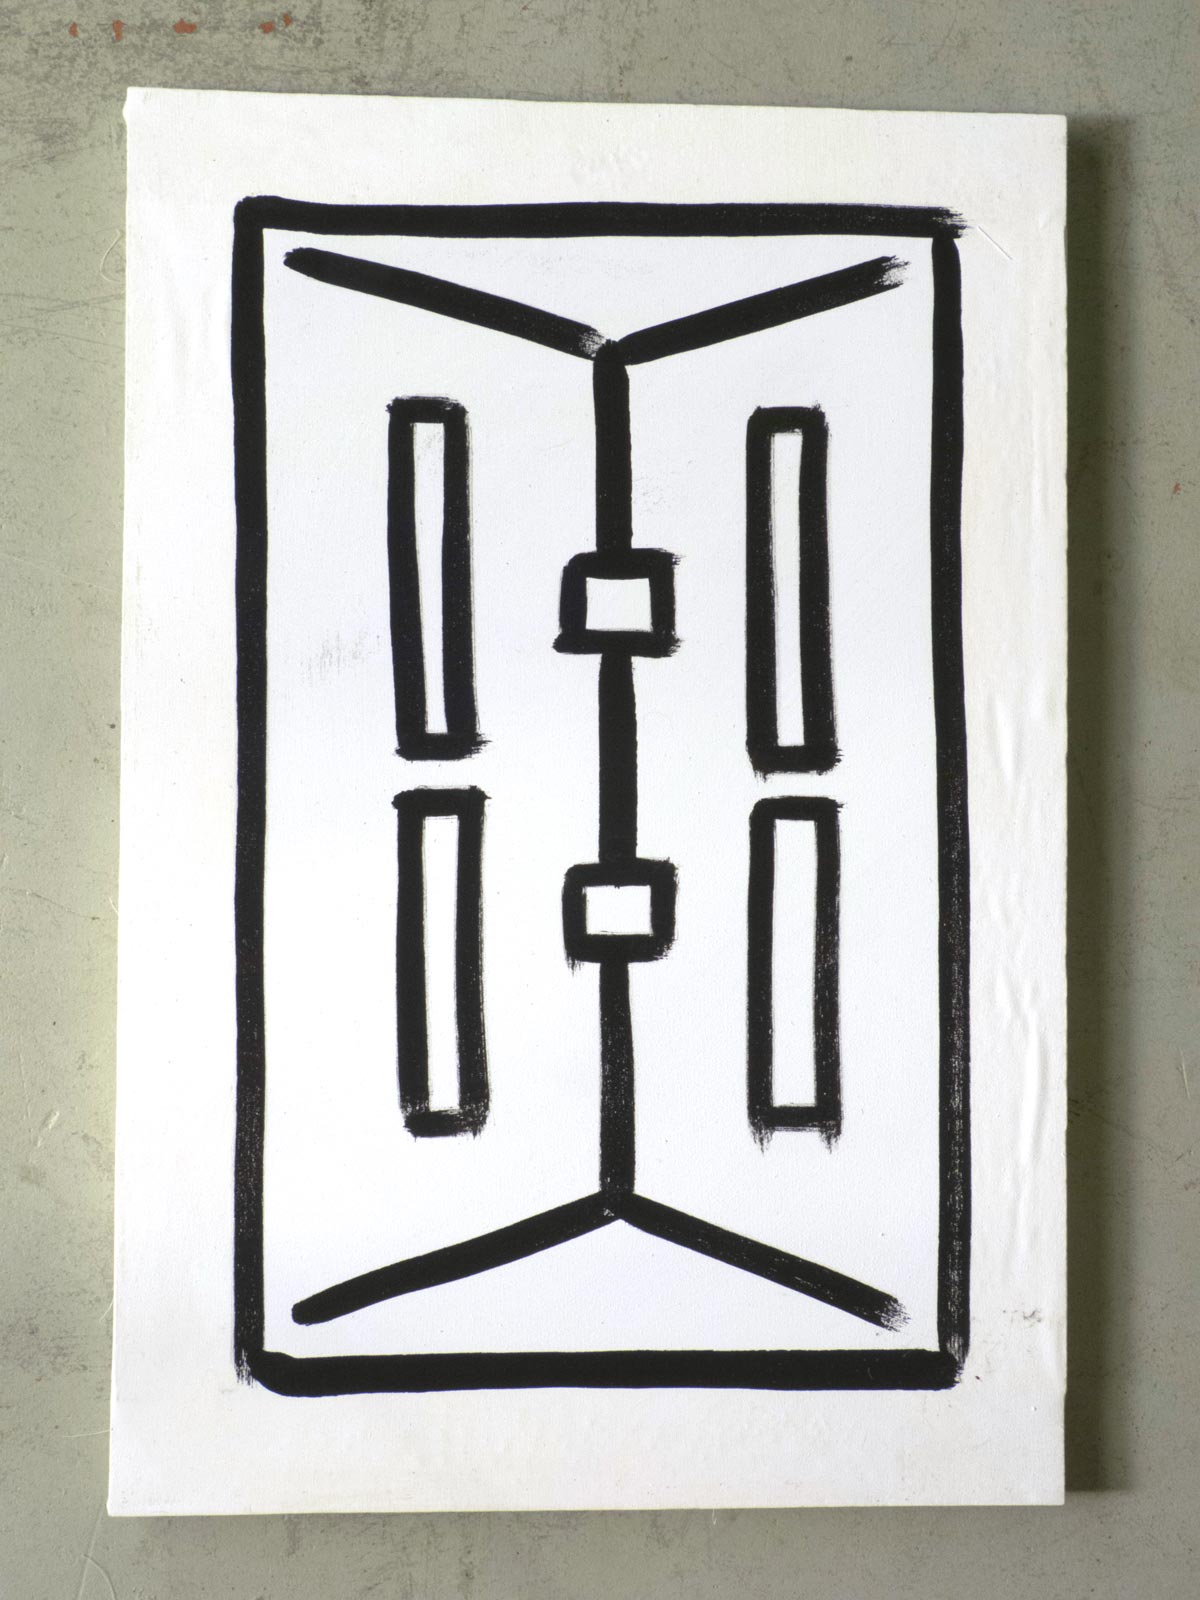 Urban-Manegold-There-is-no-Private-Privatleben-Privatsphäre-Rauminstallation-Experiment-Typographie-Portrait-Gesellschaft-Licht-Kunst-Transparent-LED-Madlight-portrait_multiplex_6